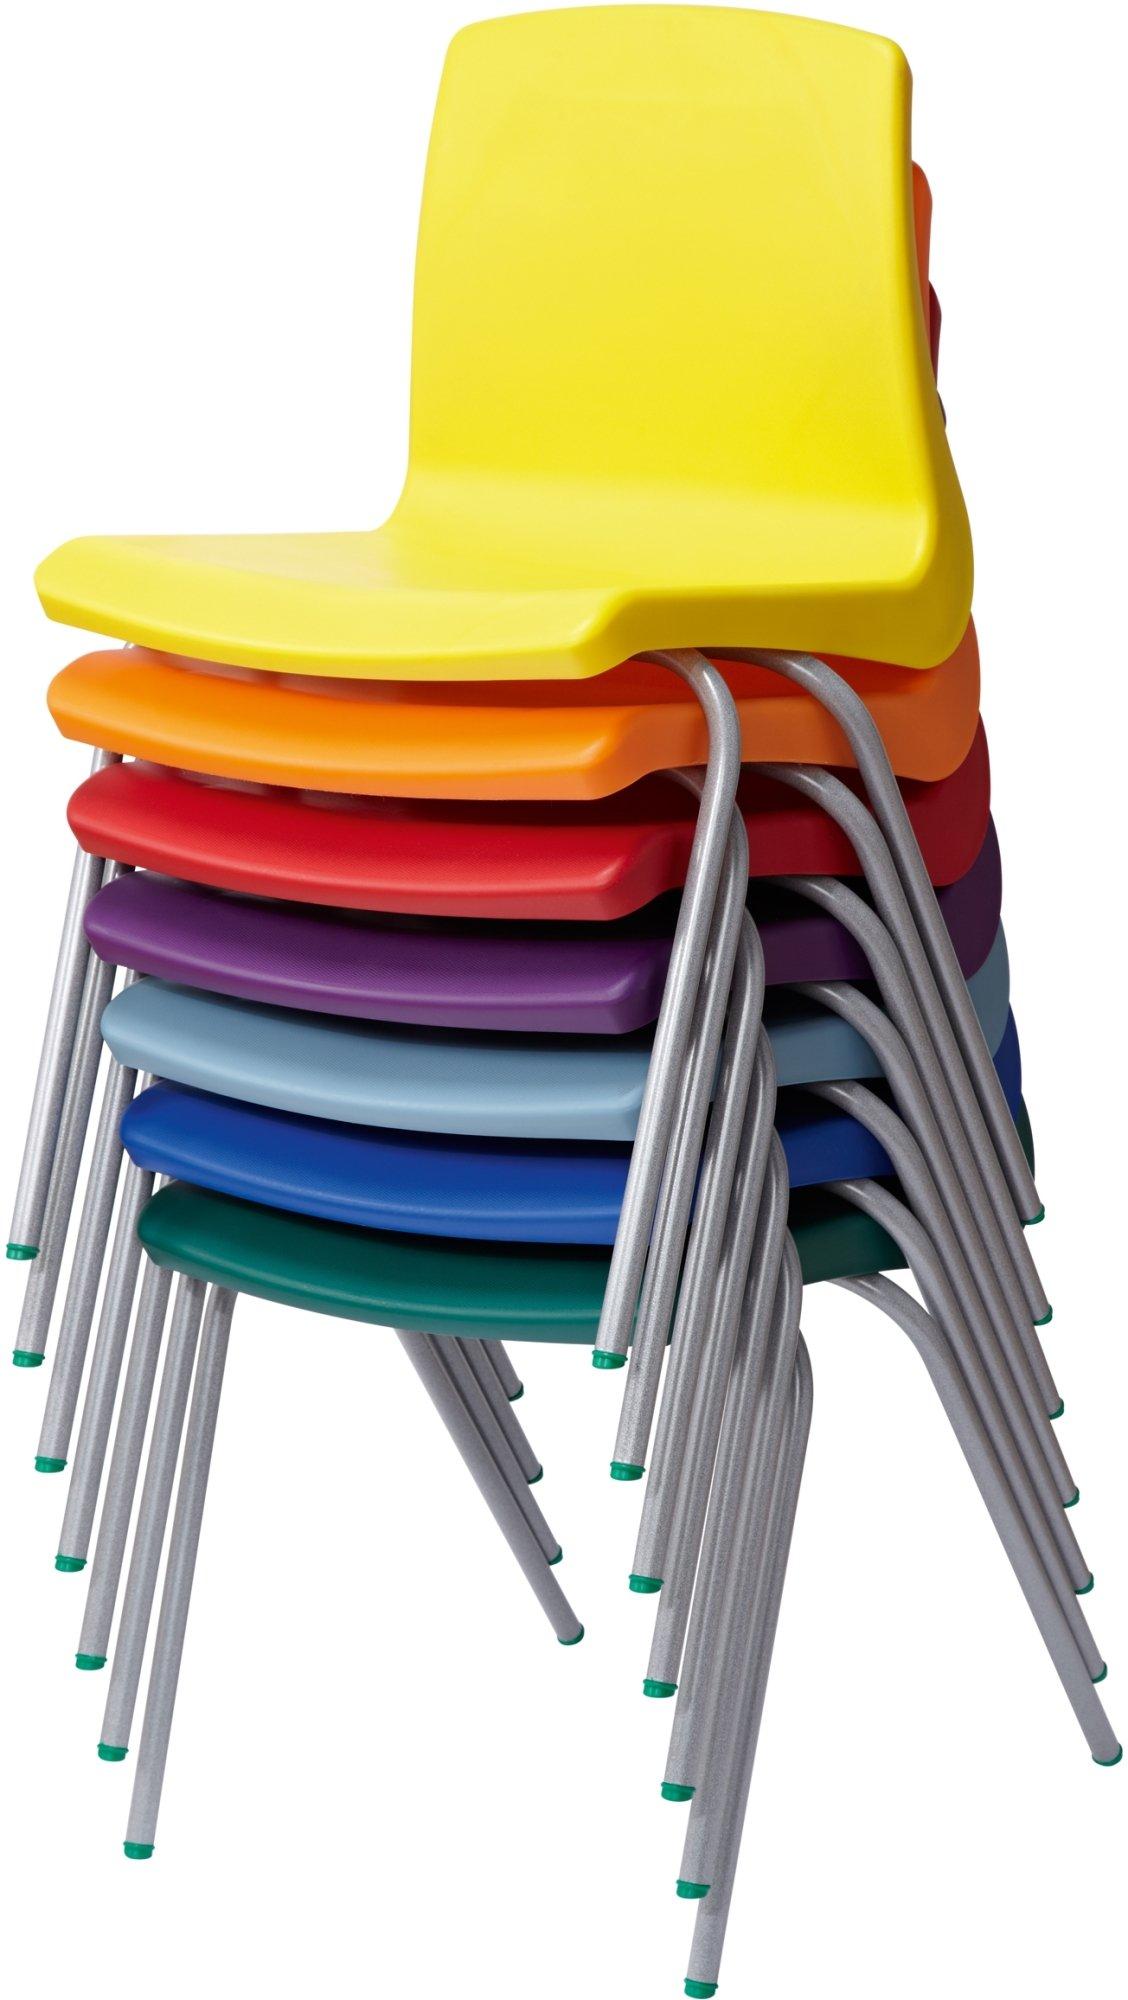 Metalliform NP Classroom Chairs Size 3 6 8 Years